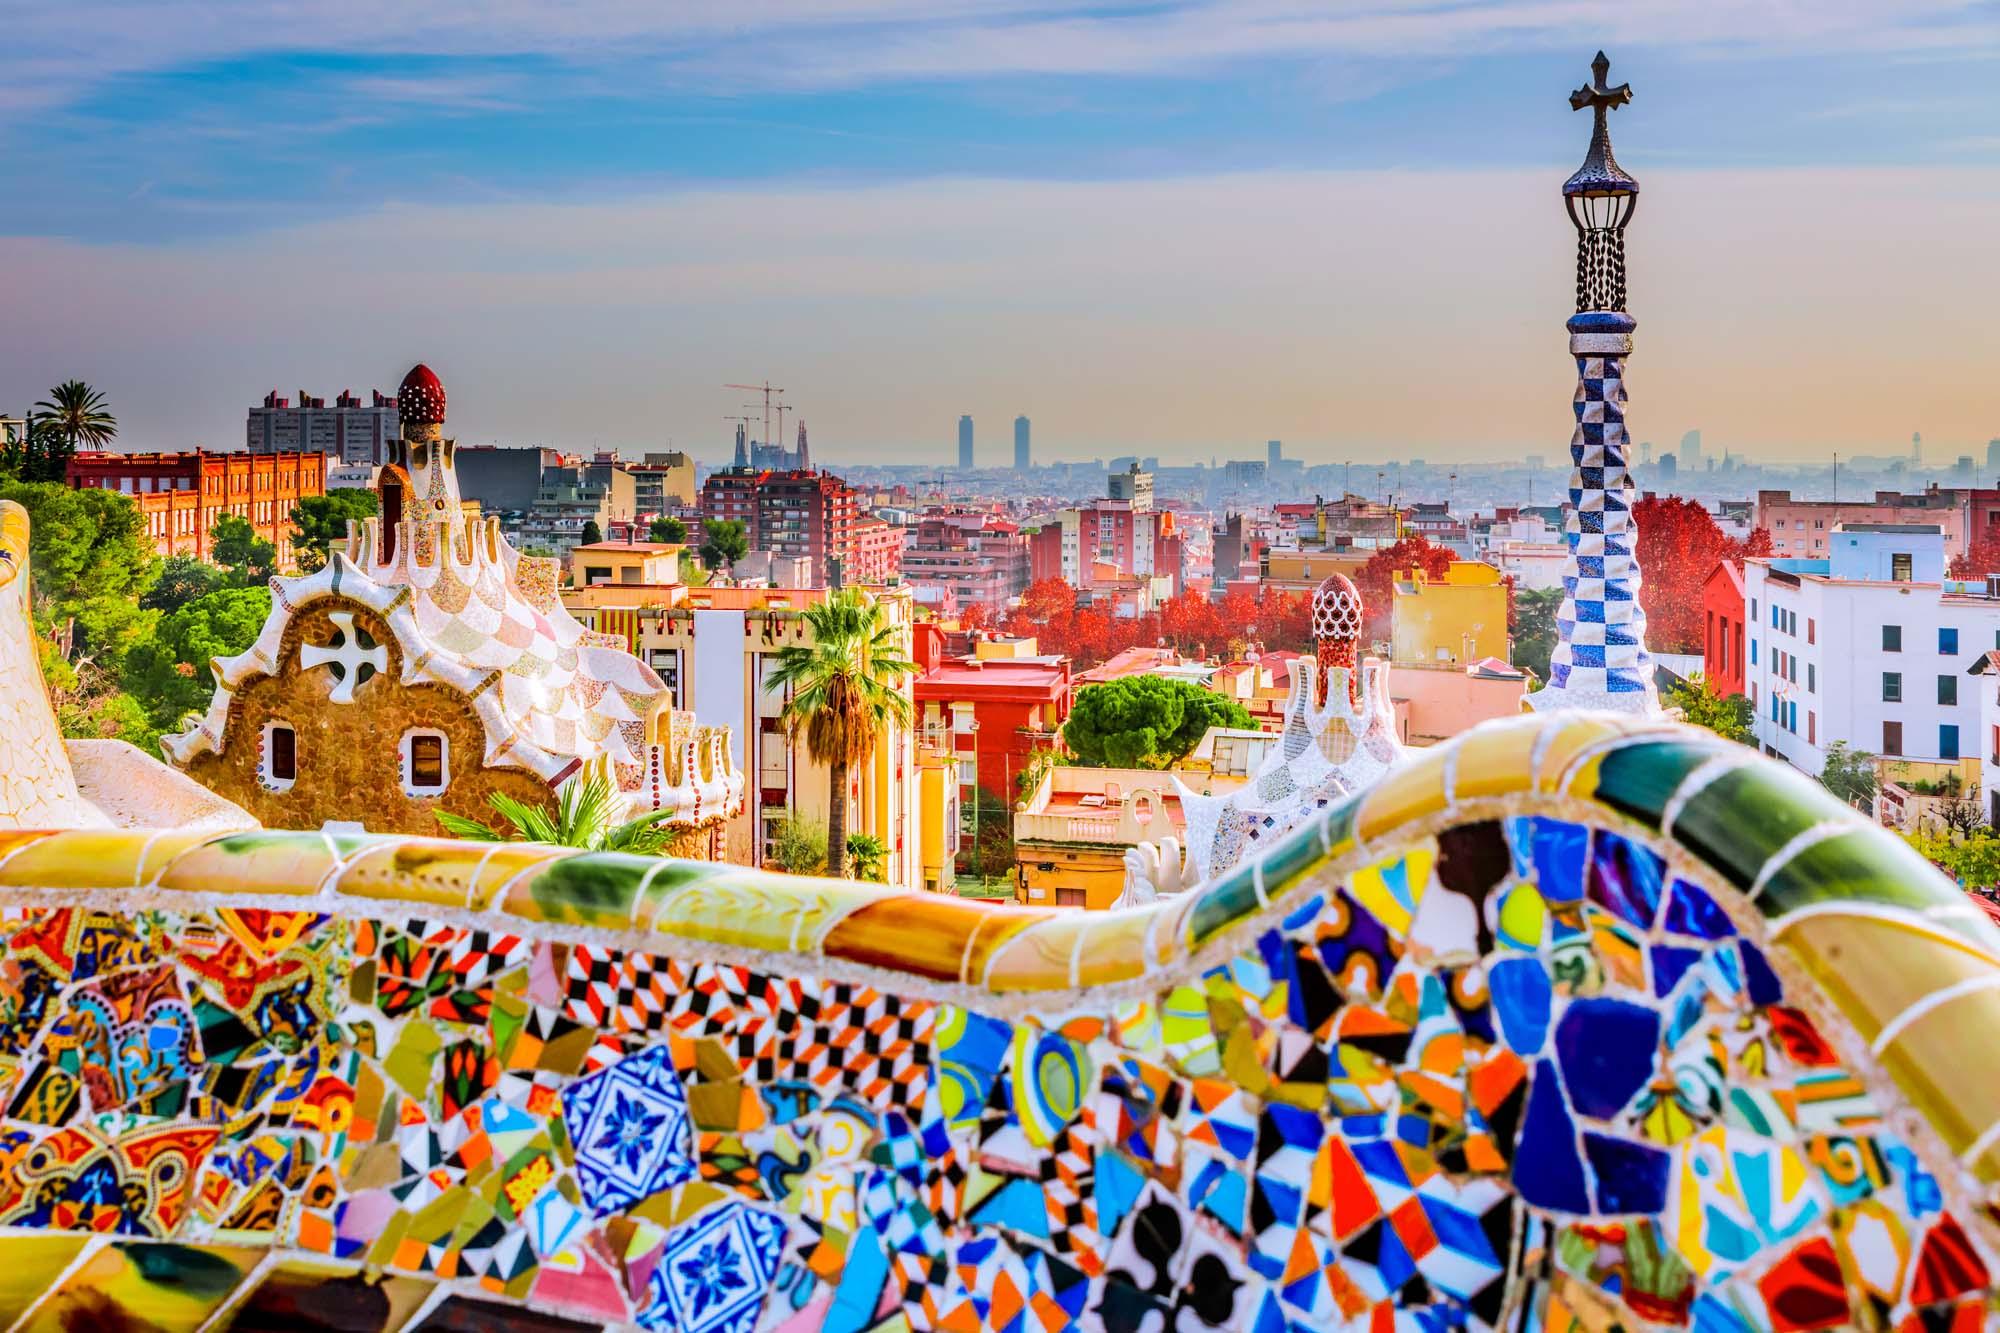 Barcelona, Spain eid summer travel destination ideas